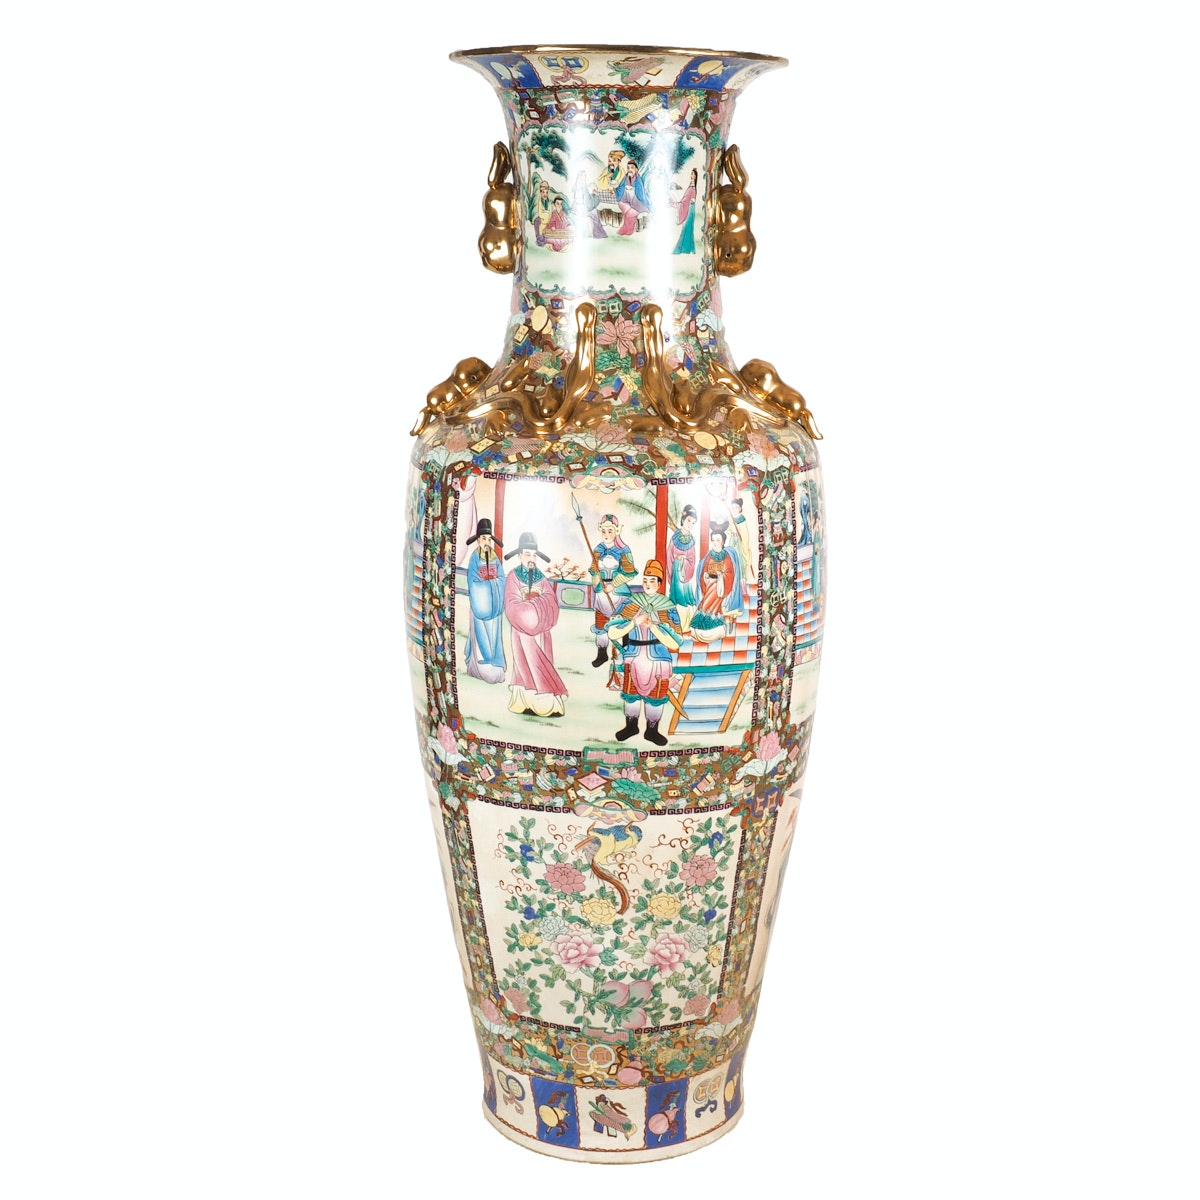 Monumental Hand-Painted Chinese Porcelain Vase